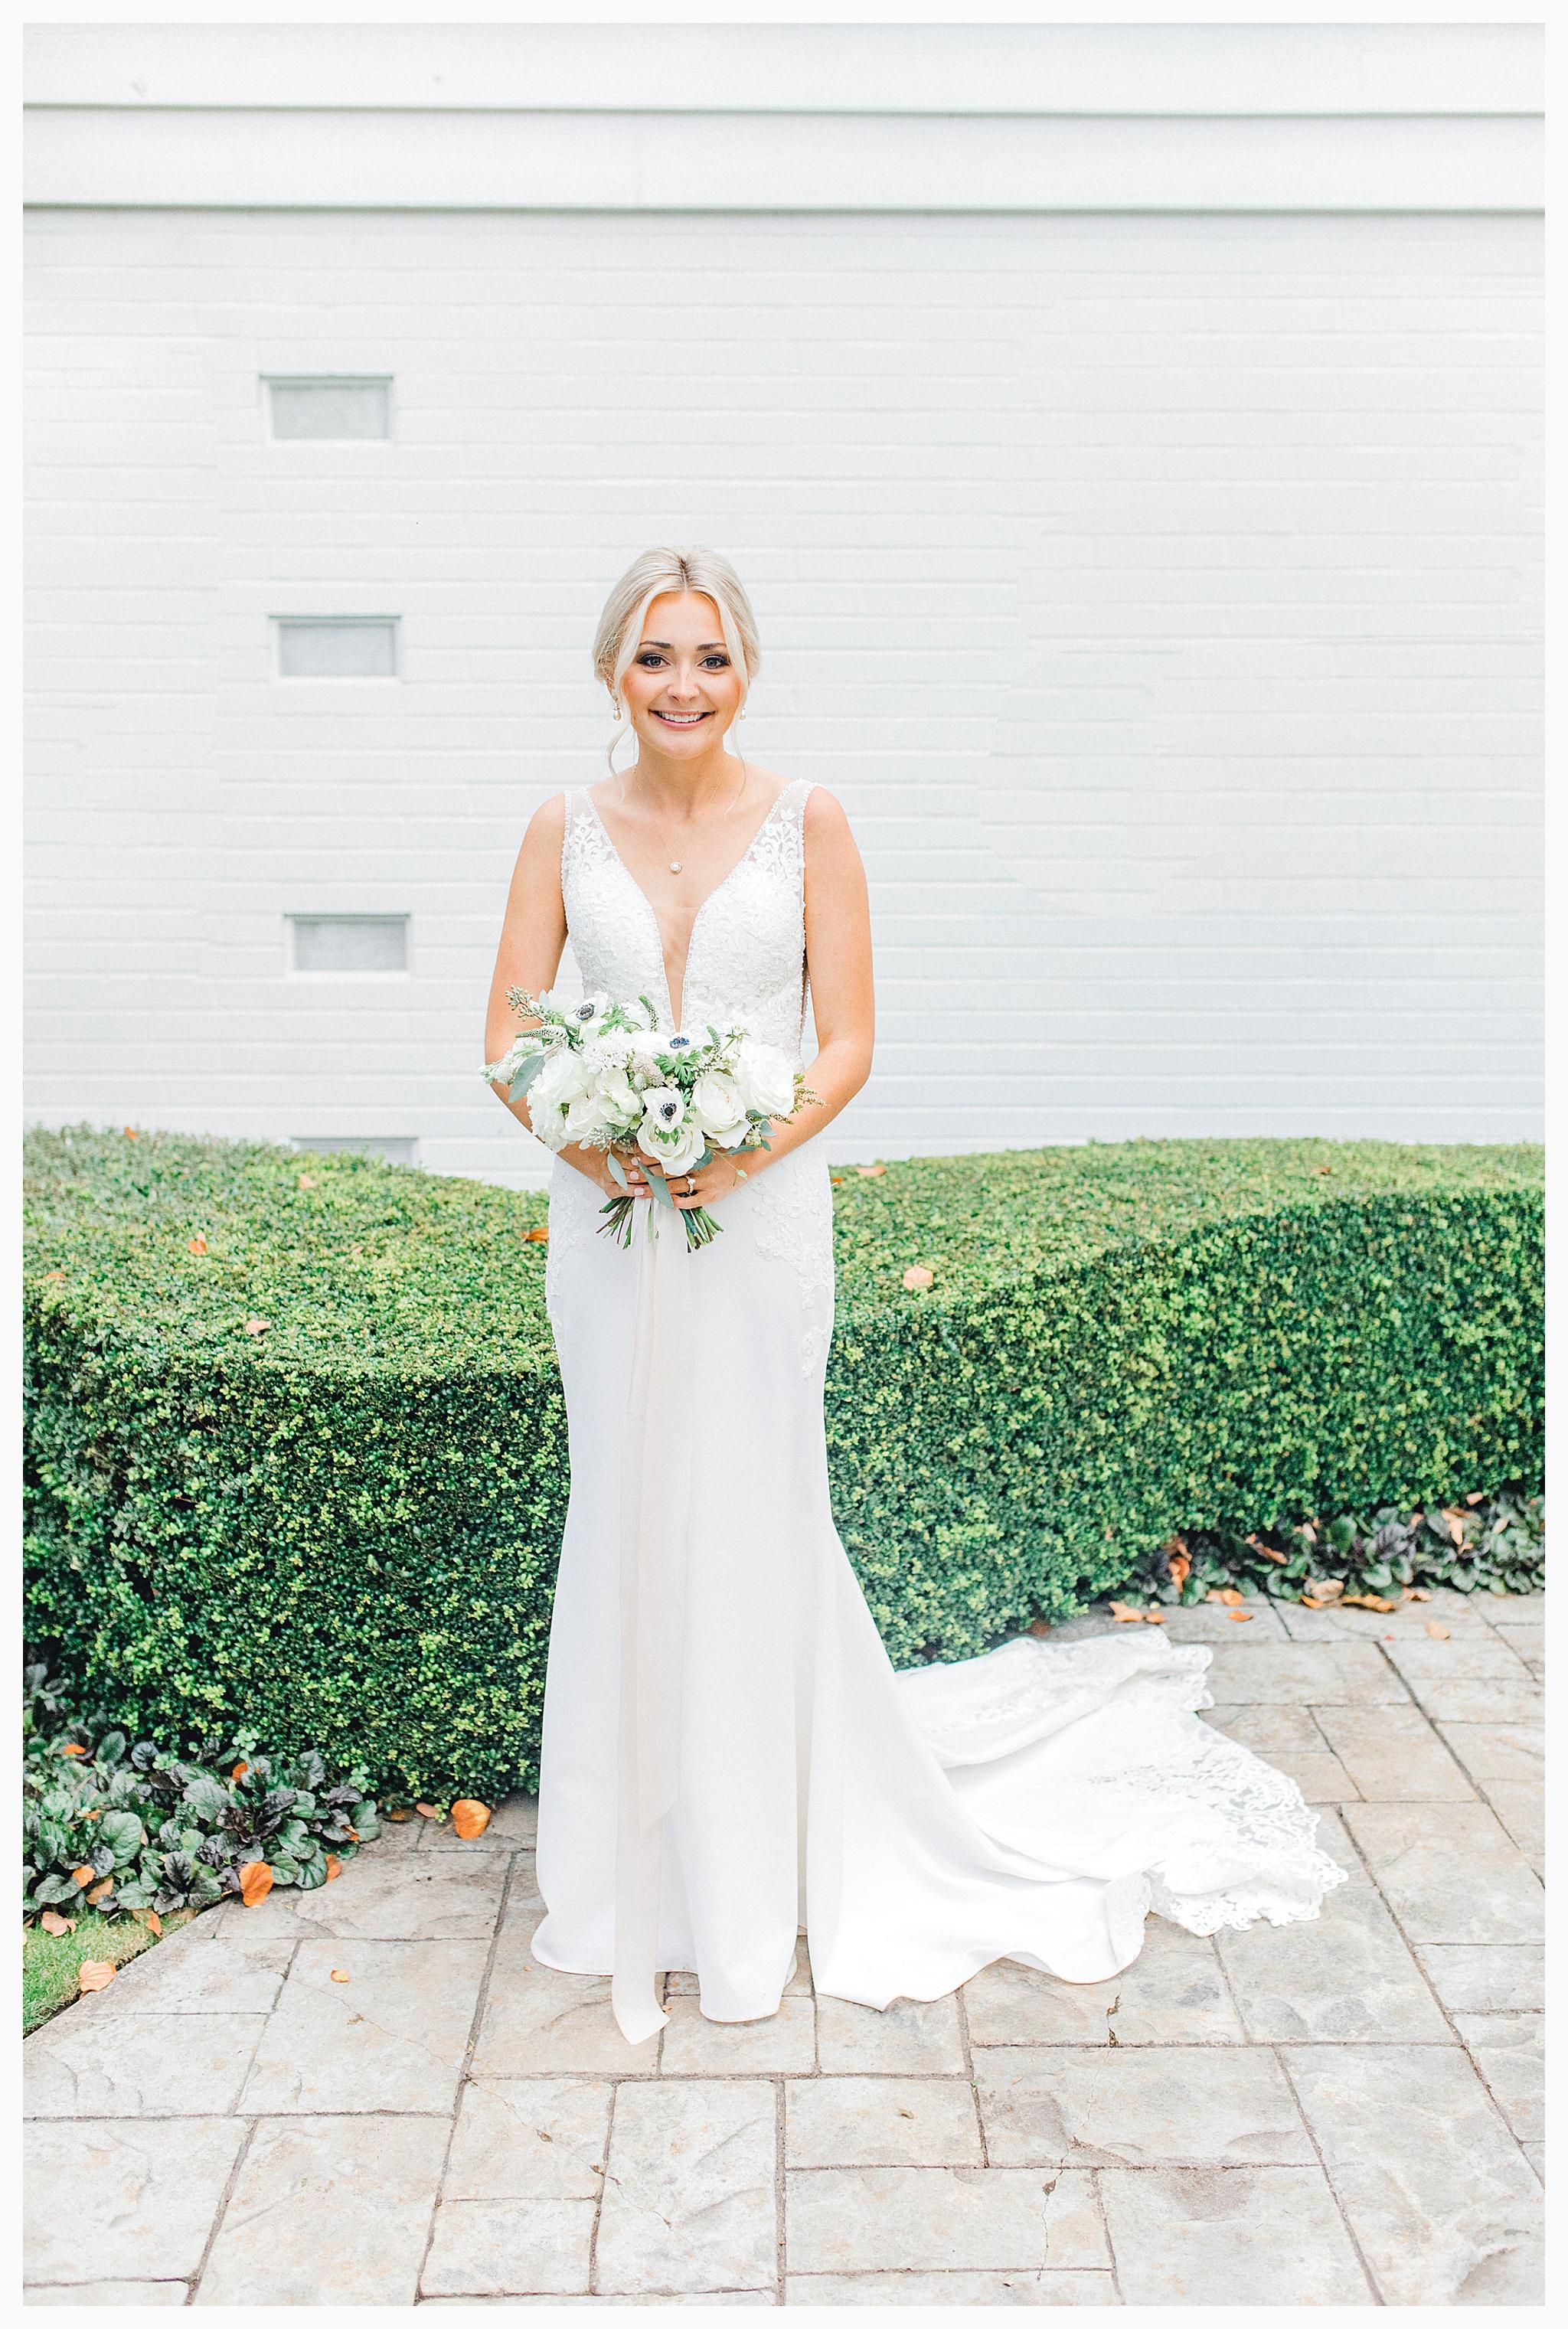 Emma Rose Company Light and Airy Wedding Photographer, Beautiful fall wedding at Rock Creek Gardens Venue in Puyallup, Washington._0134.jpg